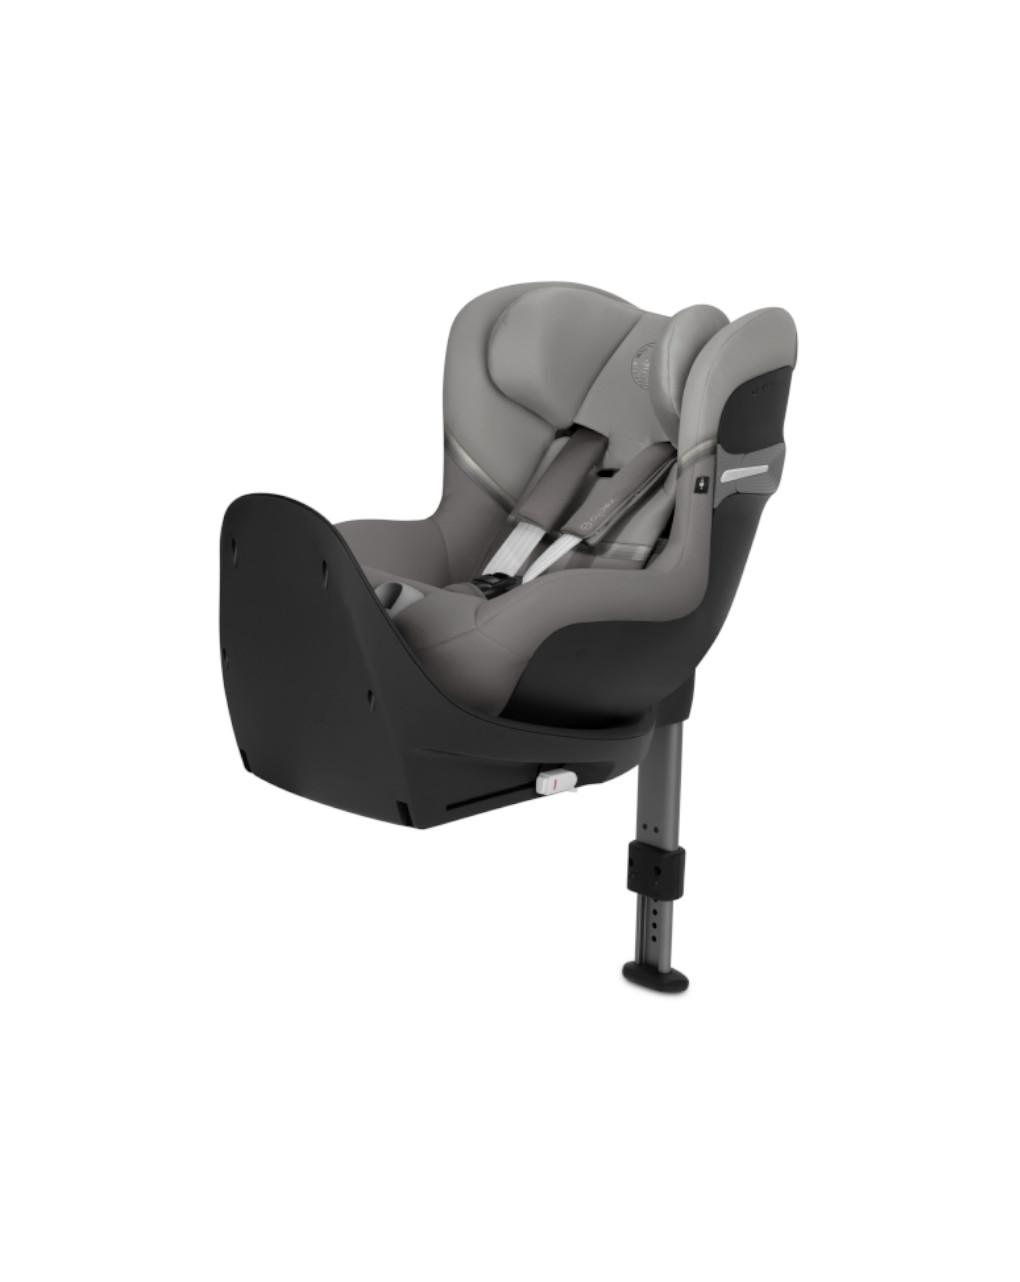 Cybex Κάθισμα Αυτοκινήτου Sirona S I-Size Soho Grey